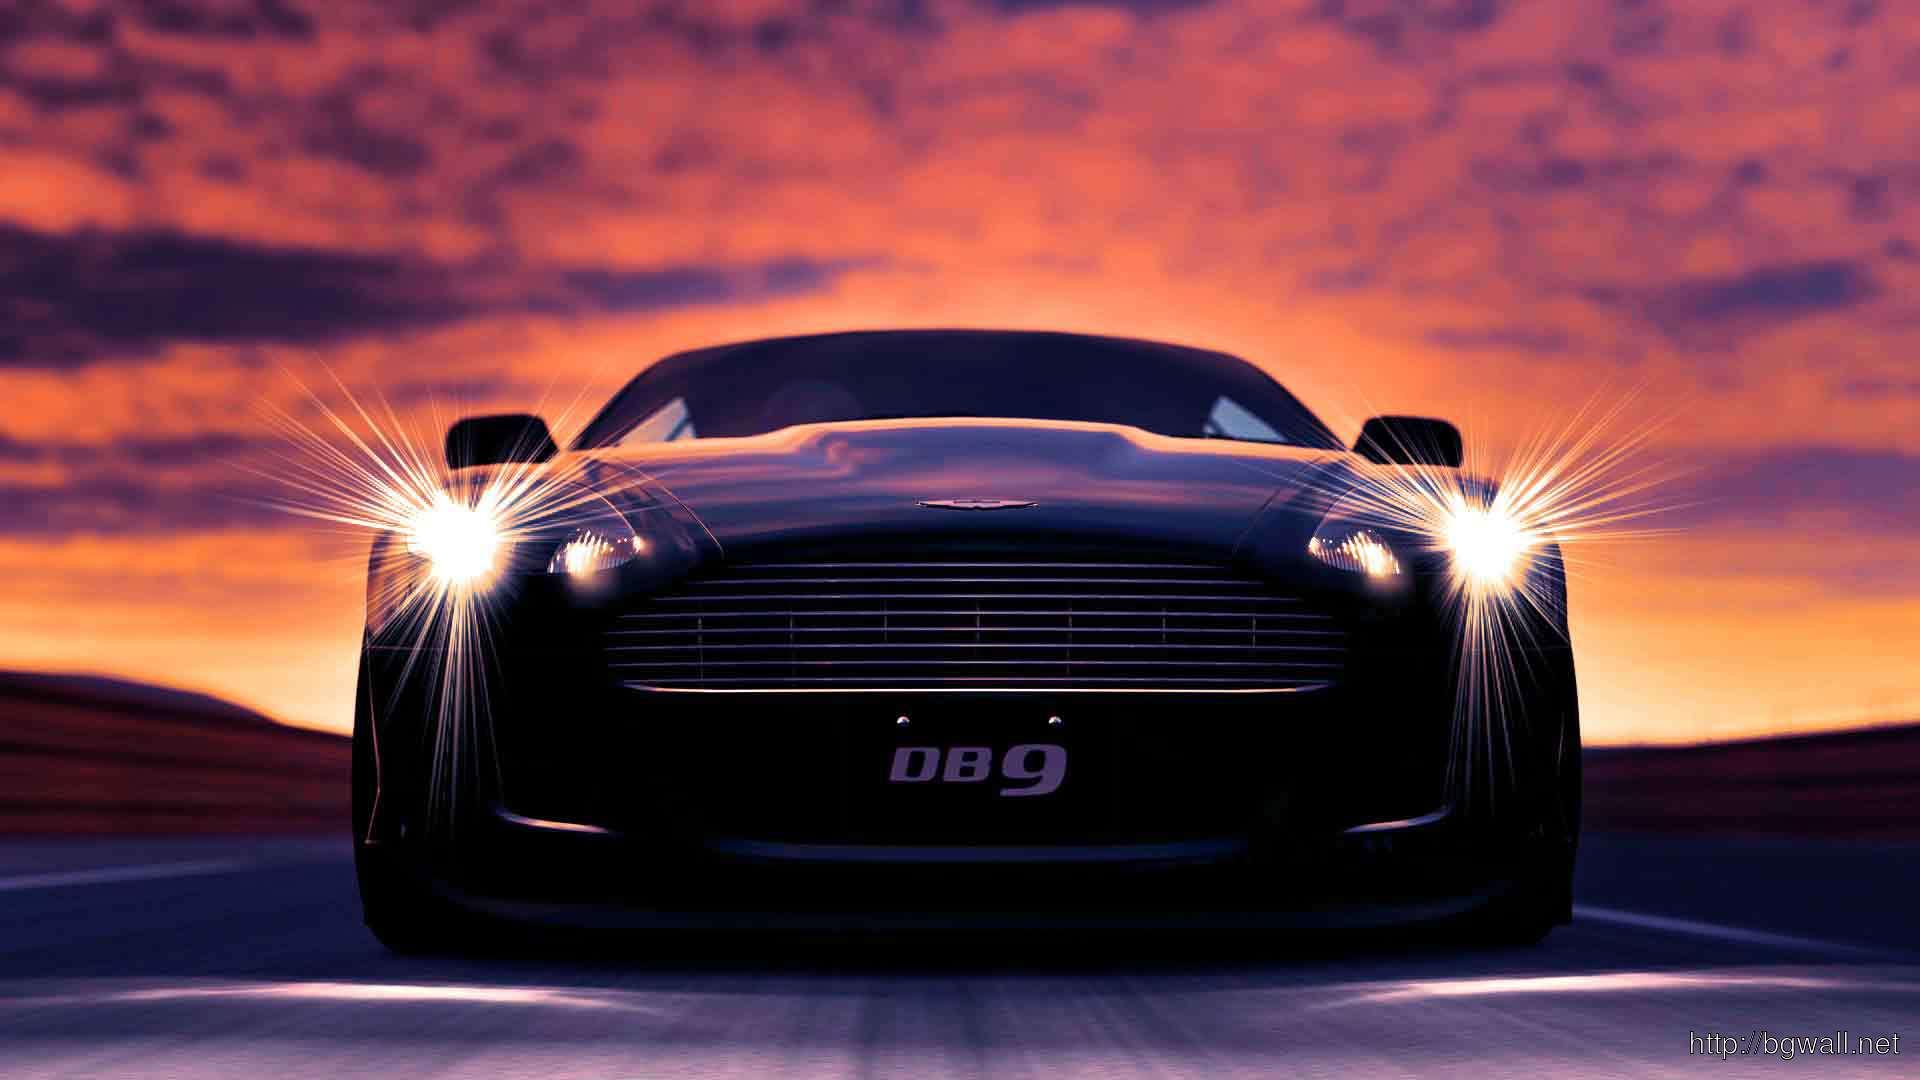 Aston-Martin-Background-HD-Wallpaper